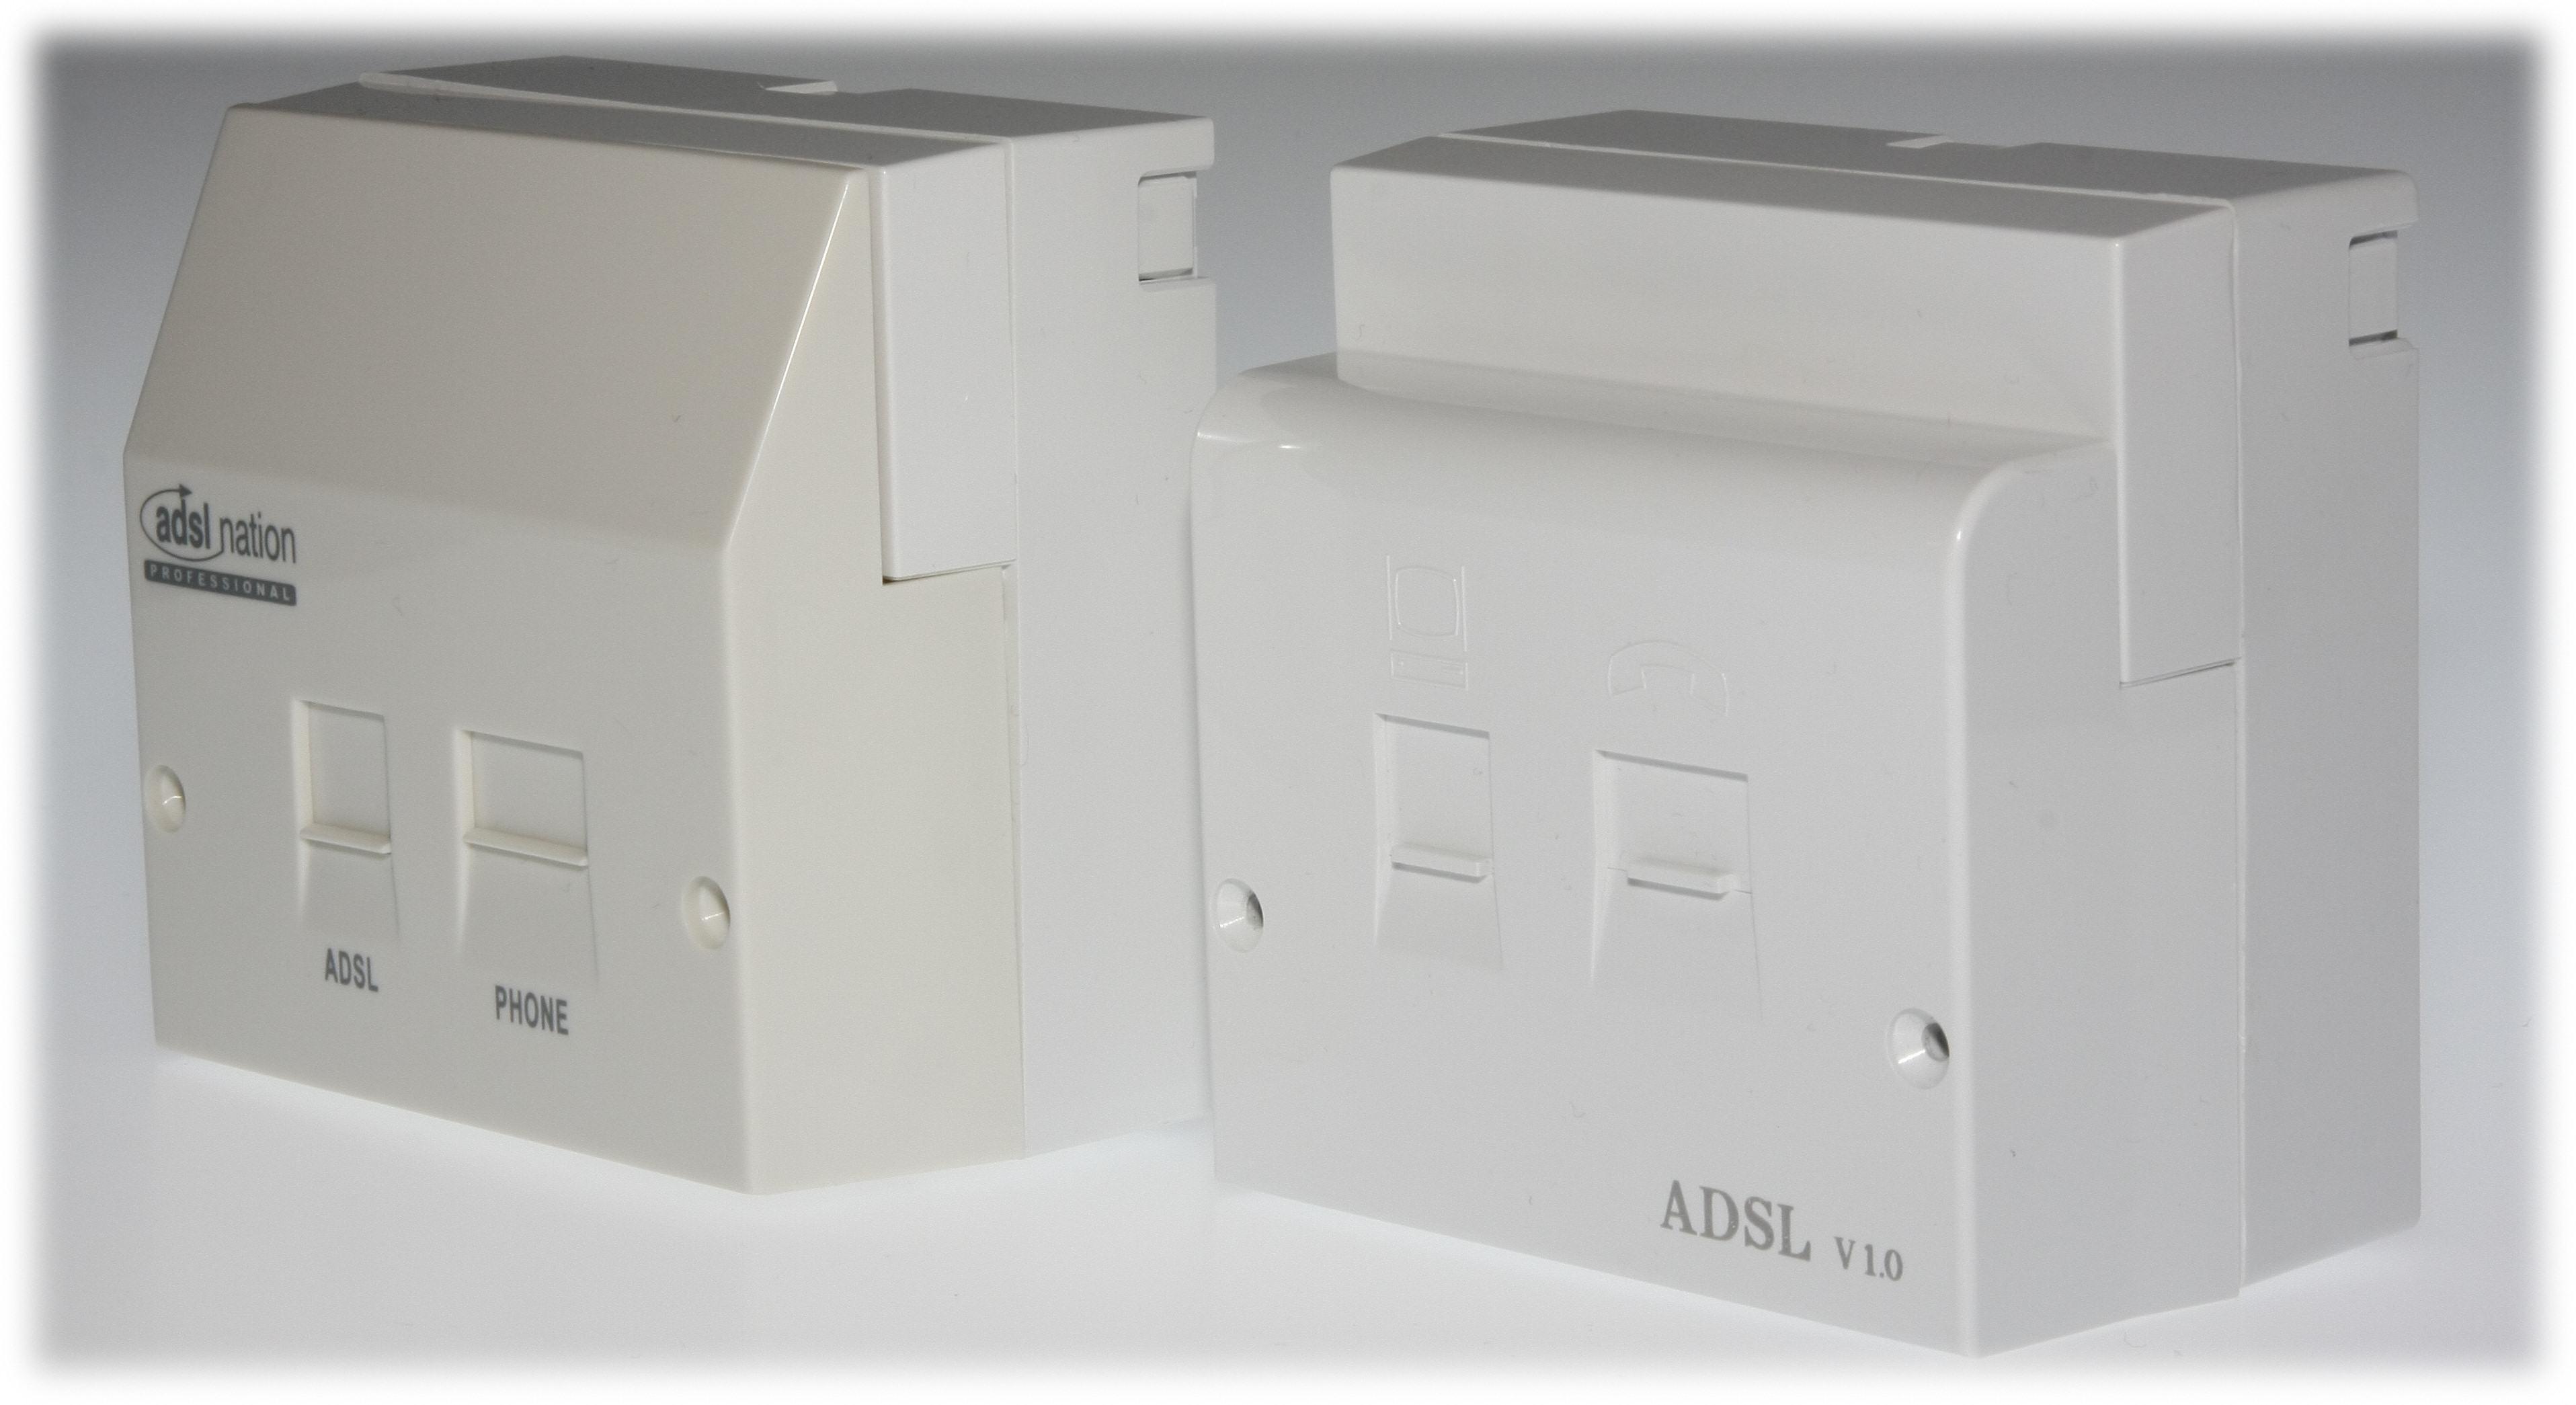 phone socket wiring diagram trailer connector 7 way identification guide thinkbroadband